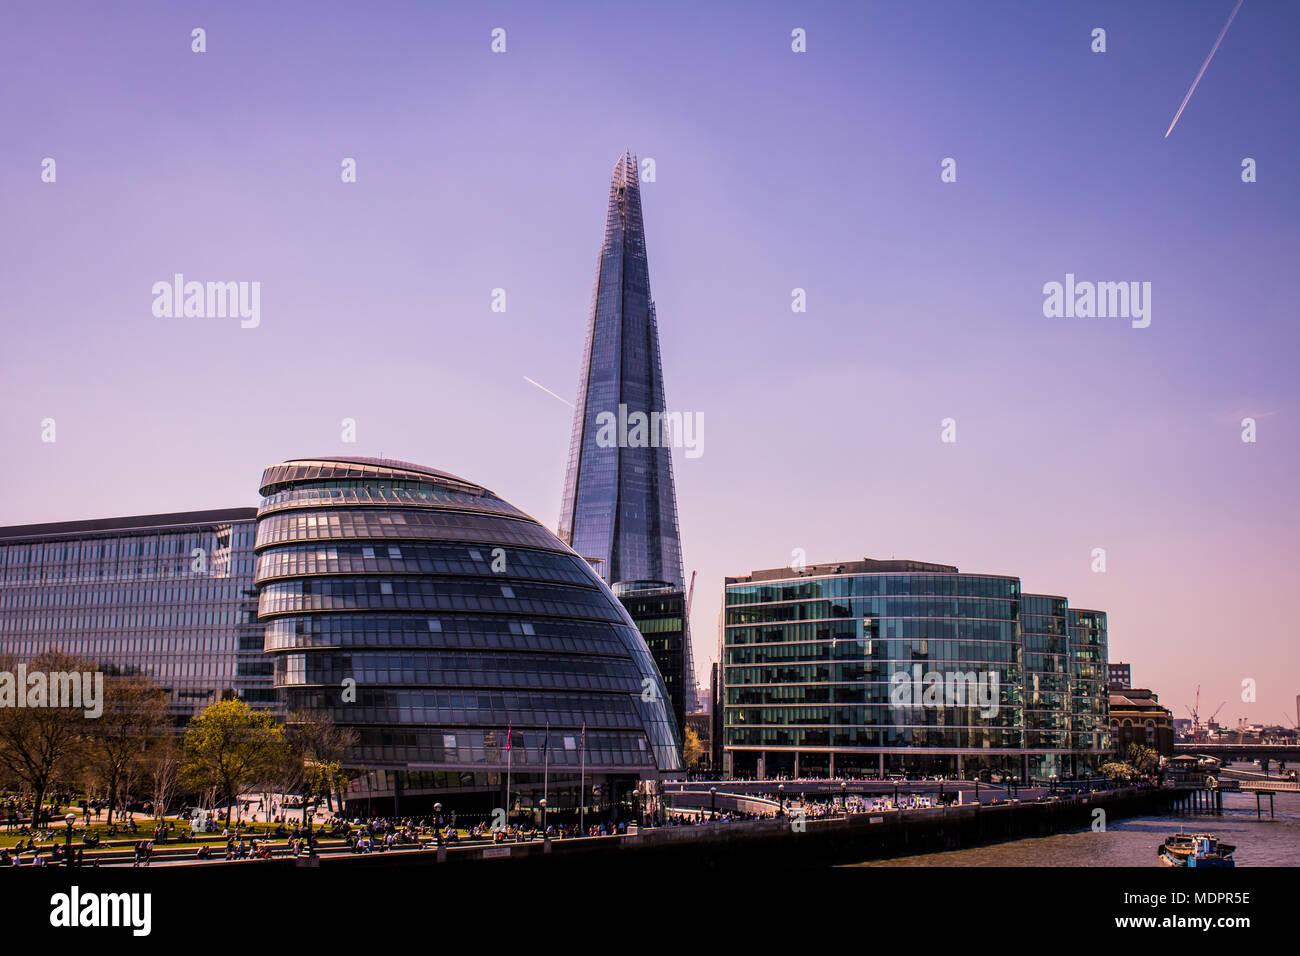 Sun rising over the Beautiful Landmarks of London. View of the Shard and London Bridge. Sensational Summer. - Stock Image